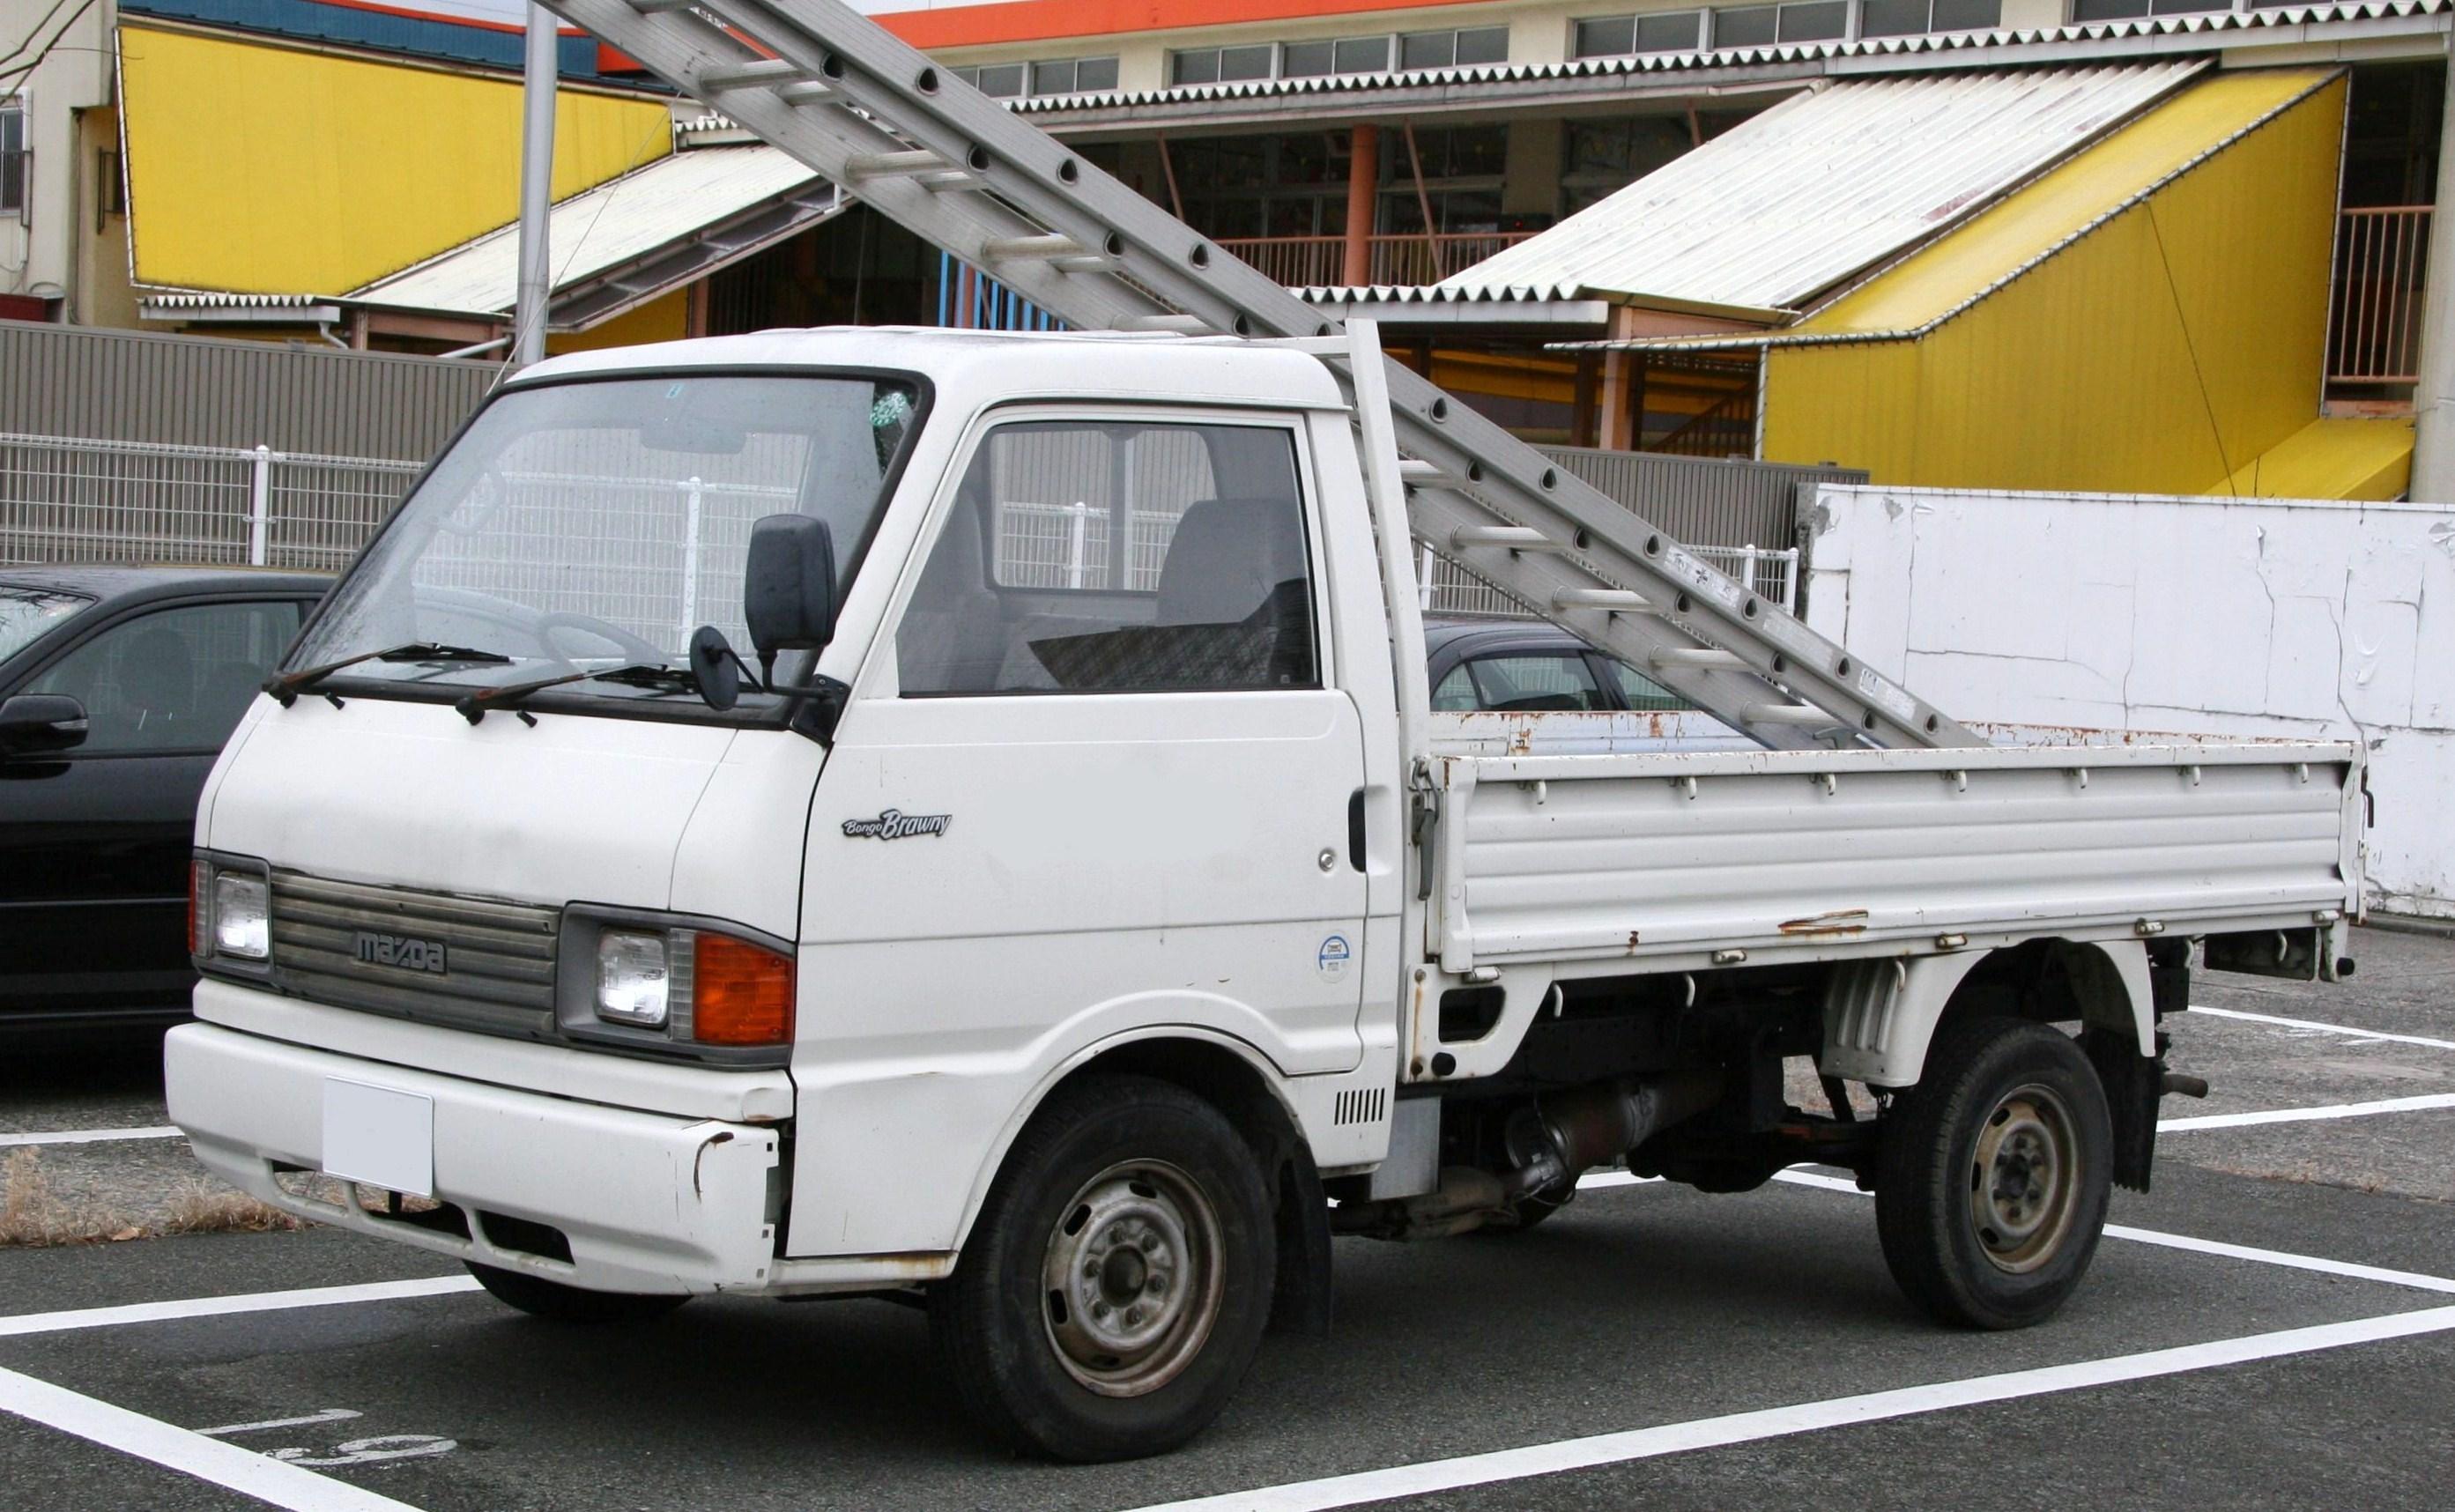 File:Mazda Bongo Brawny.jpg - Wikimedia Commons